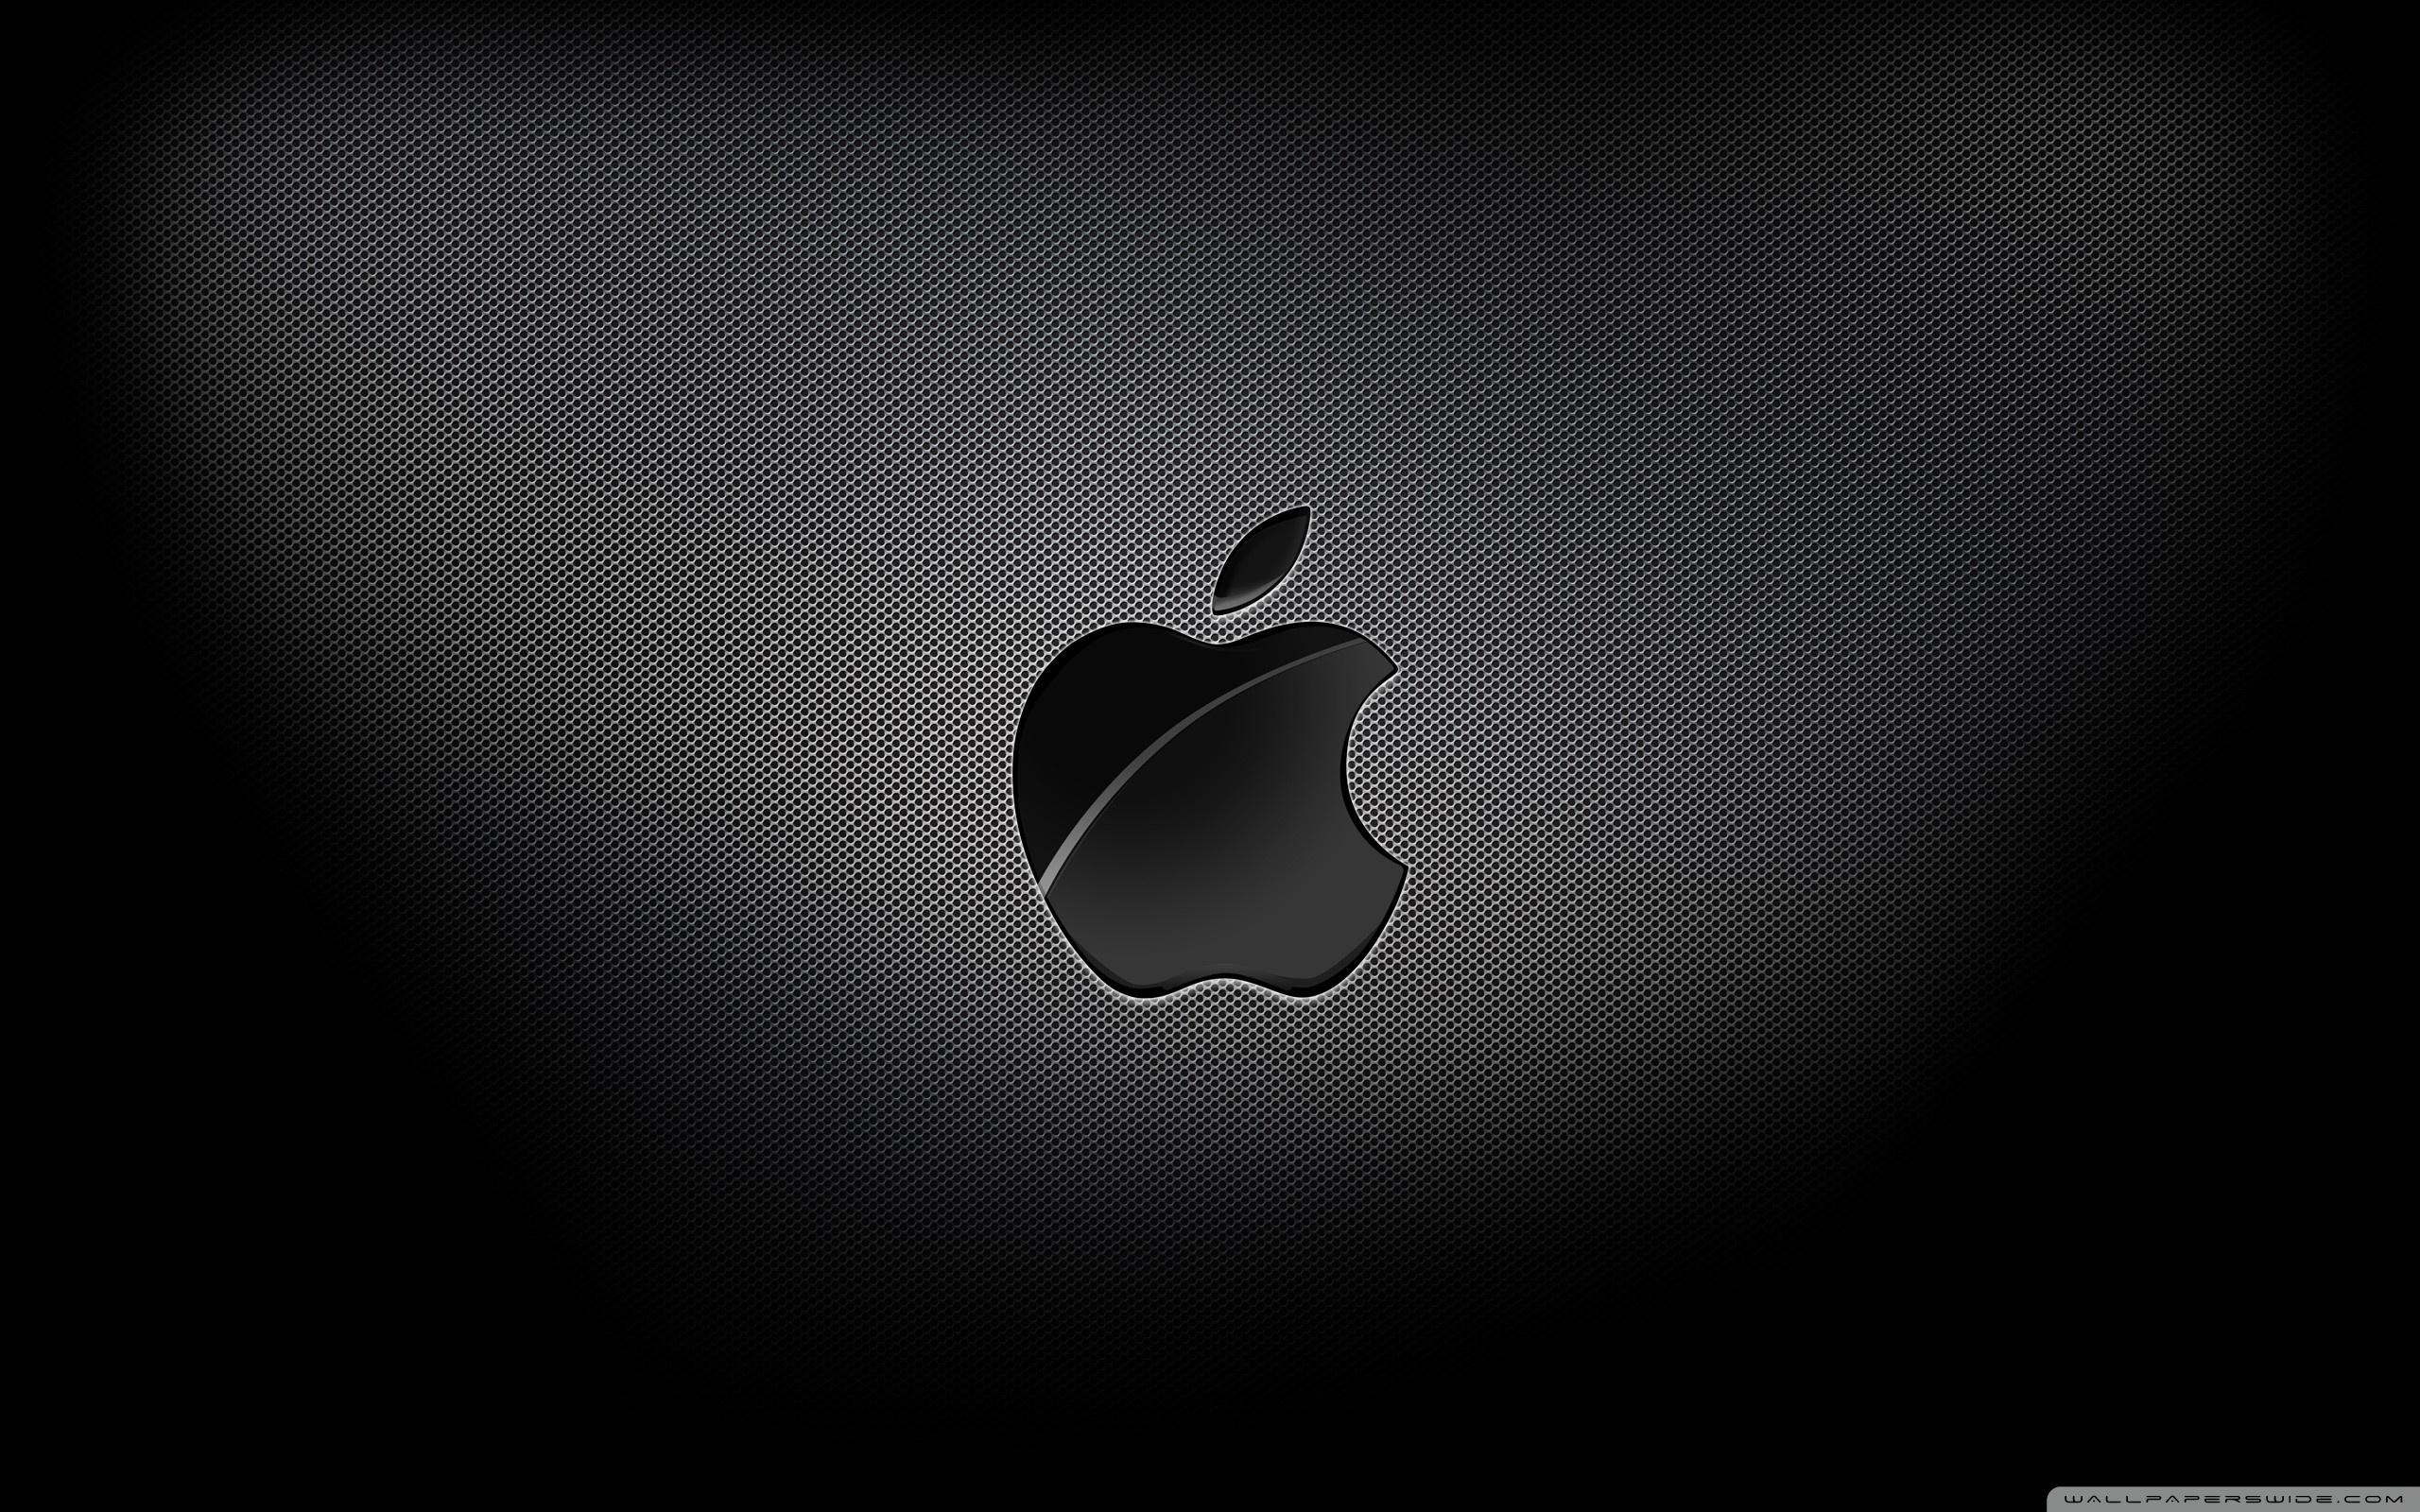 Apple Black Background HD desktop wallpaper : High Definition